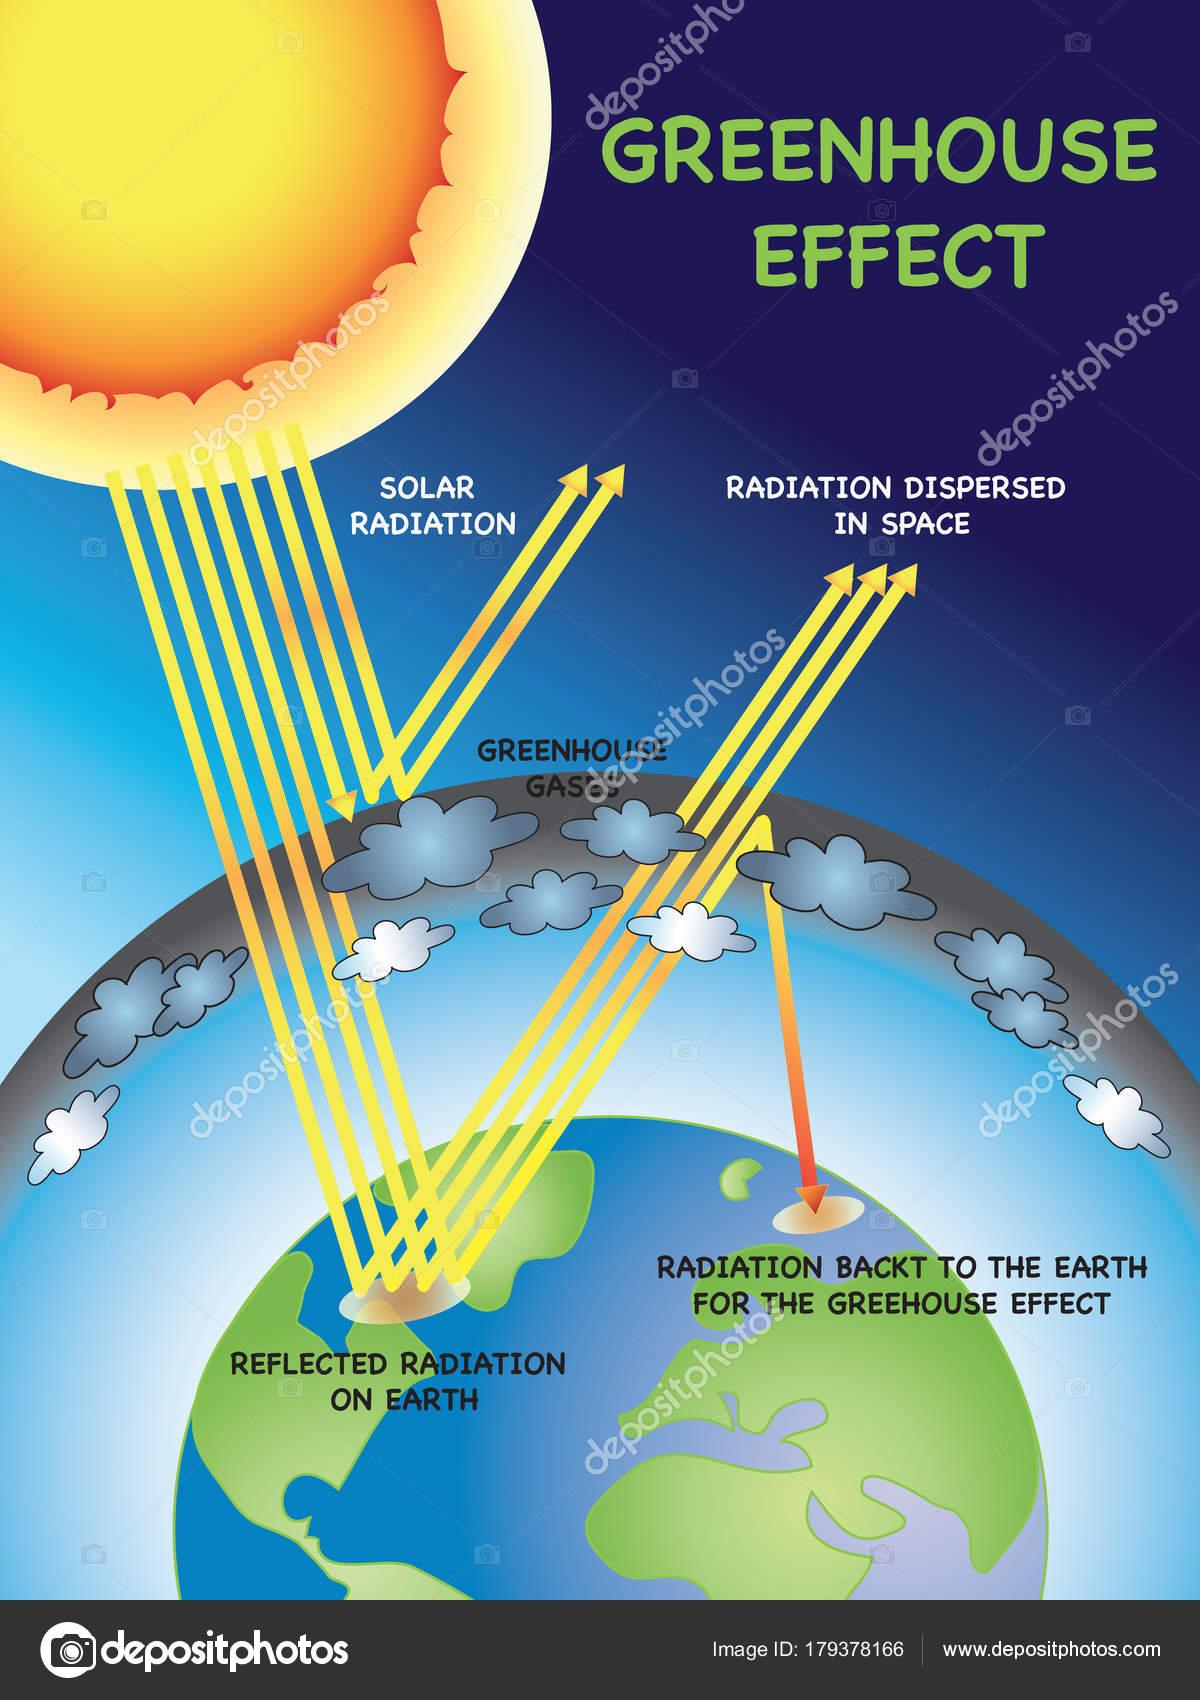 Greenhouse Effect Illustration